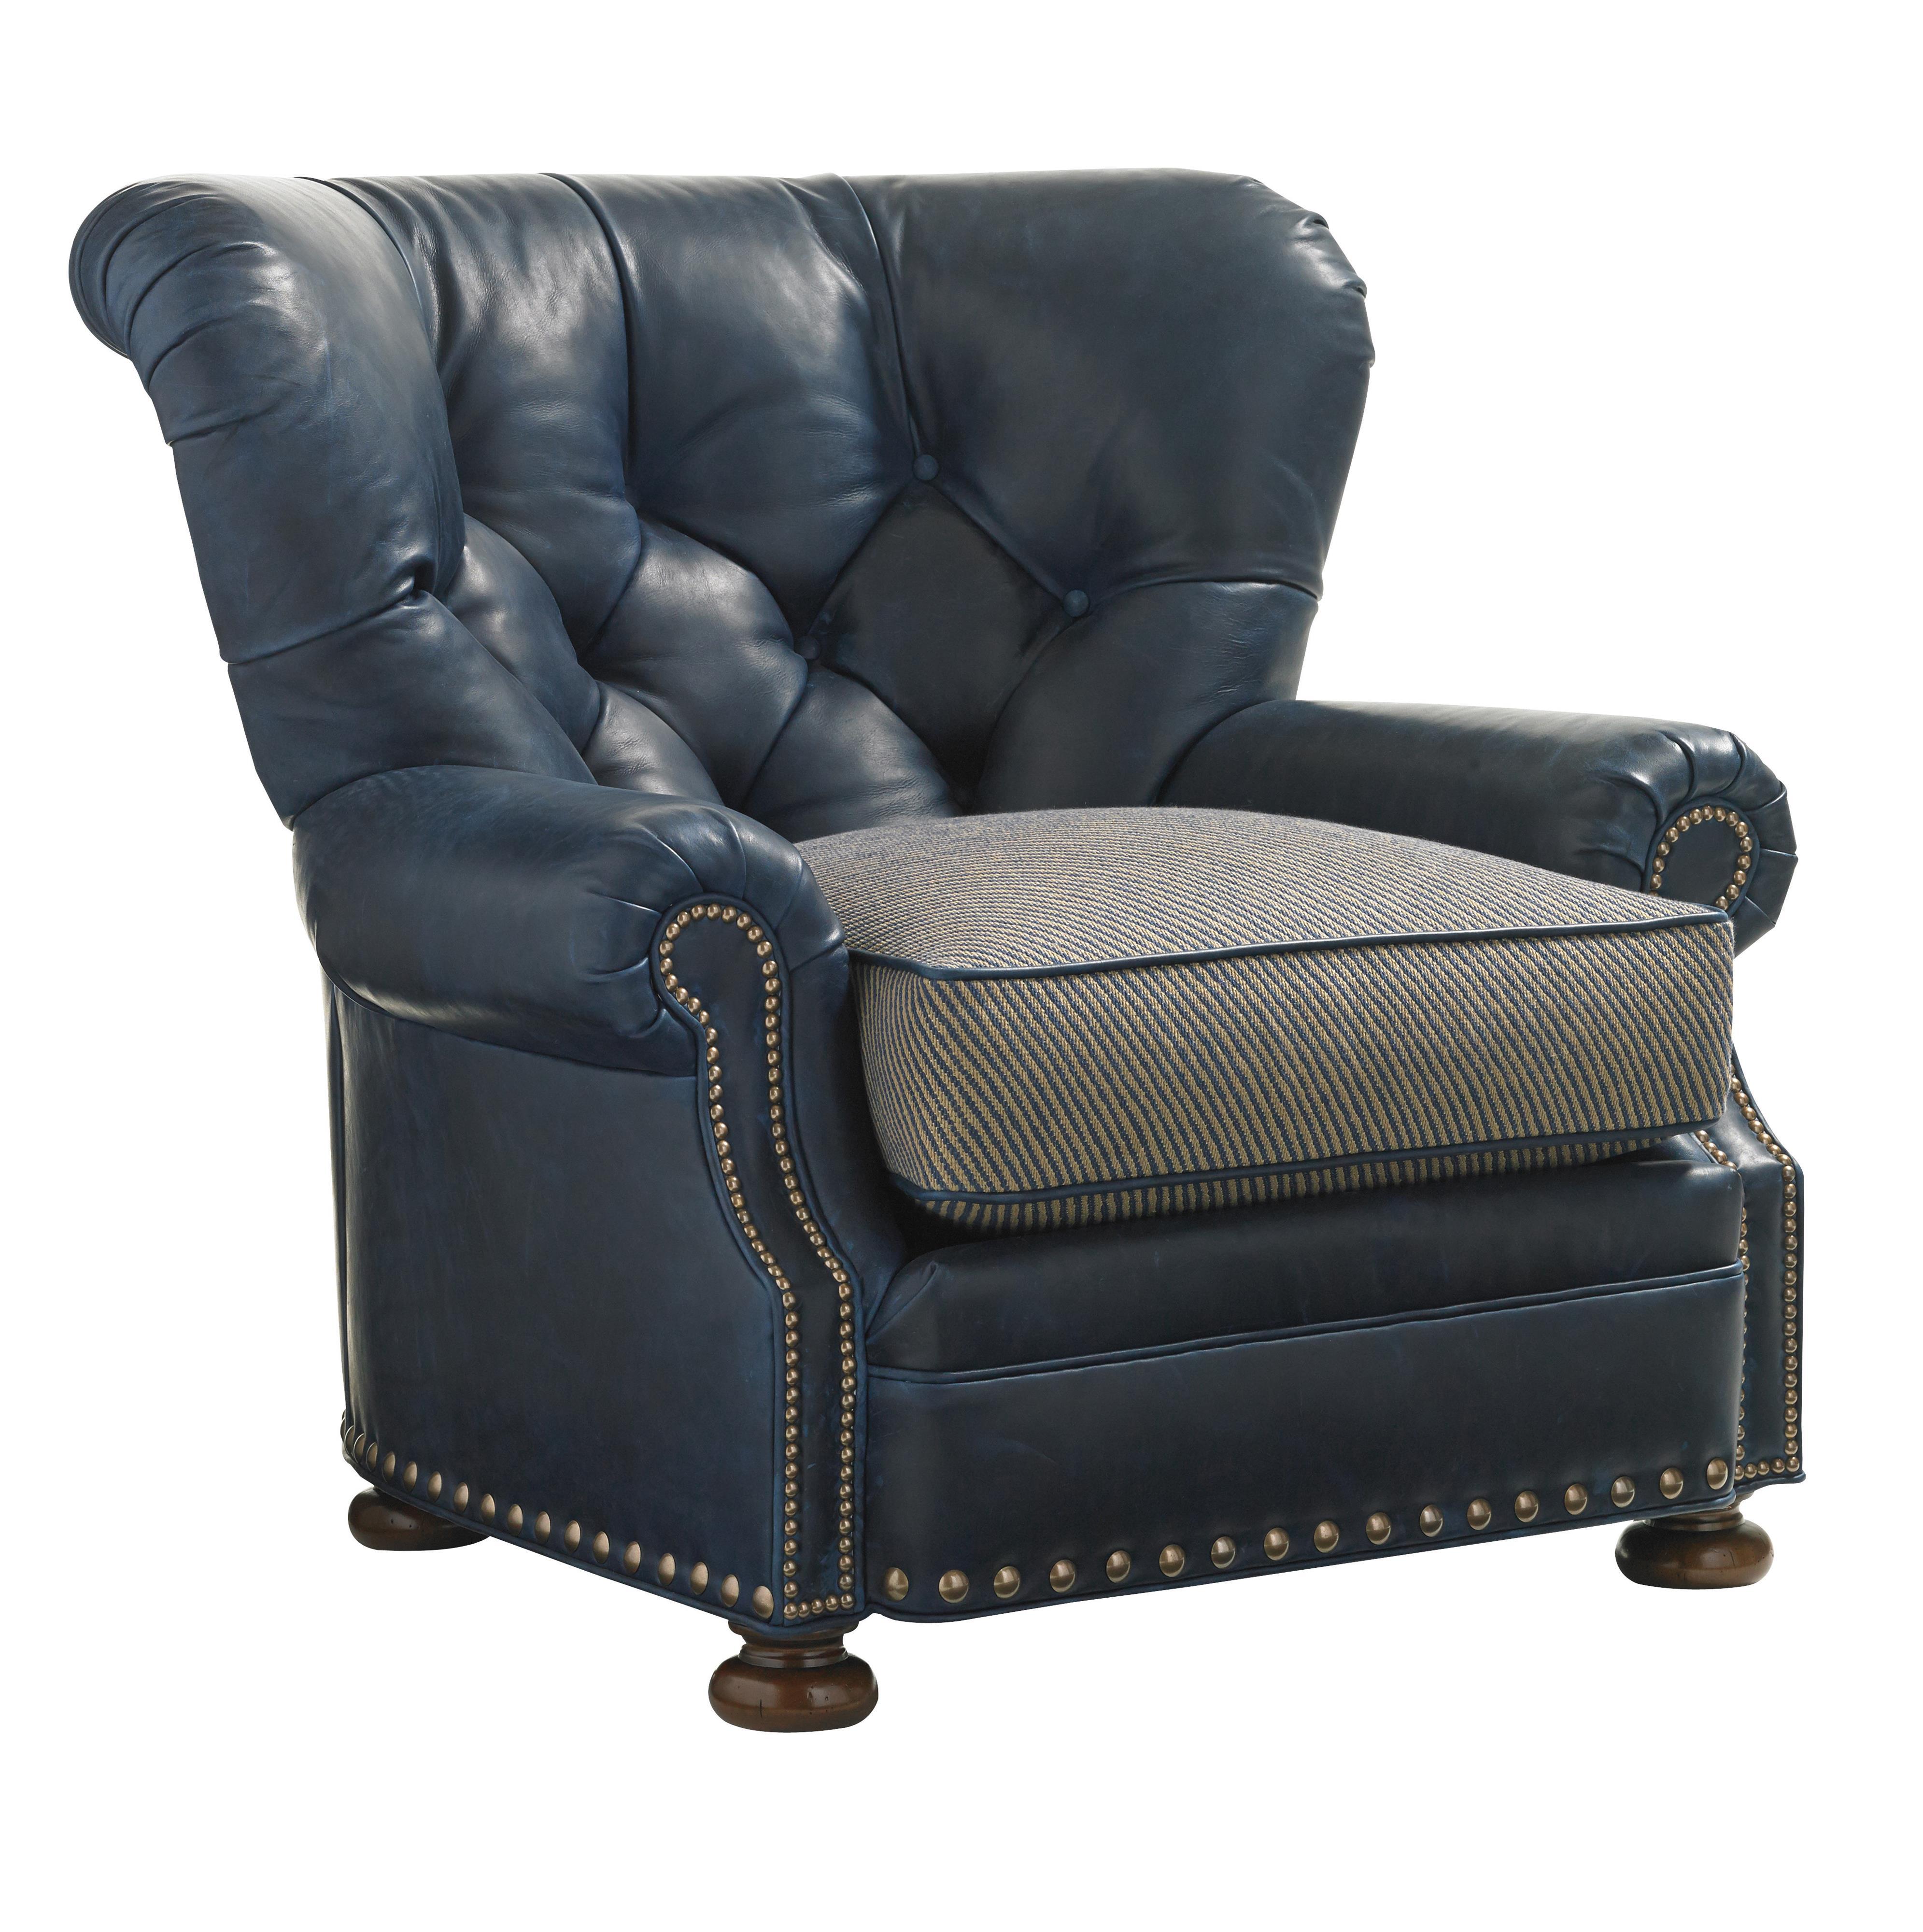 Lexington Leather Elle Chair by Lexington at Johnny Janosik